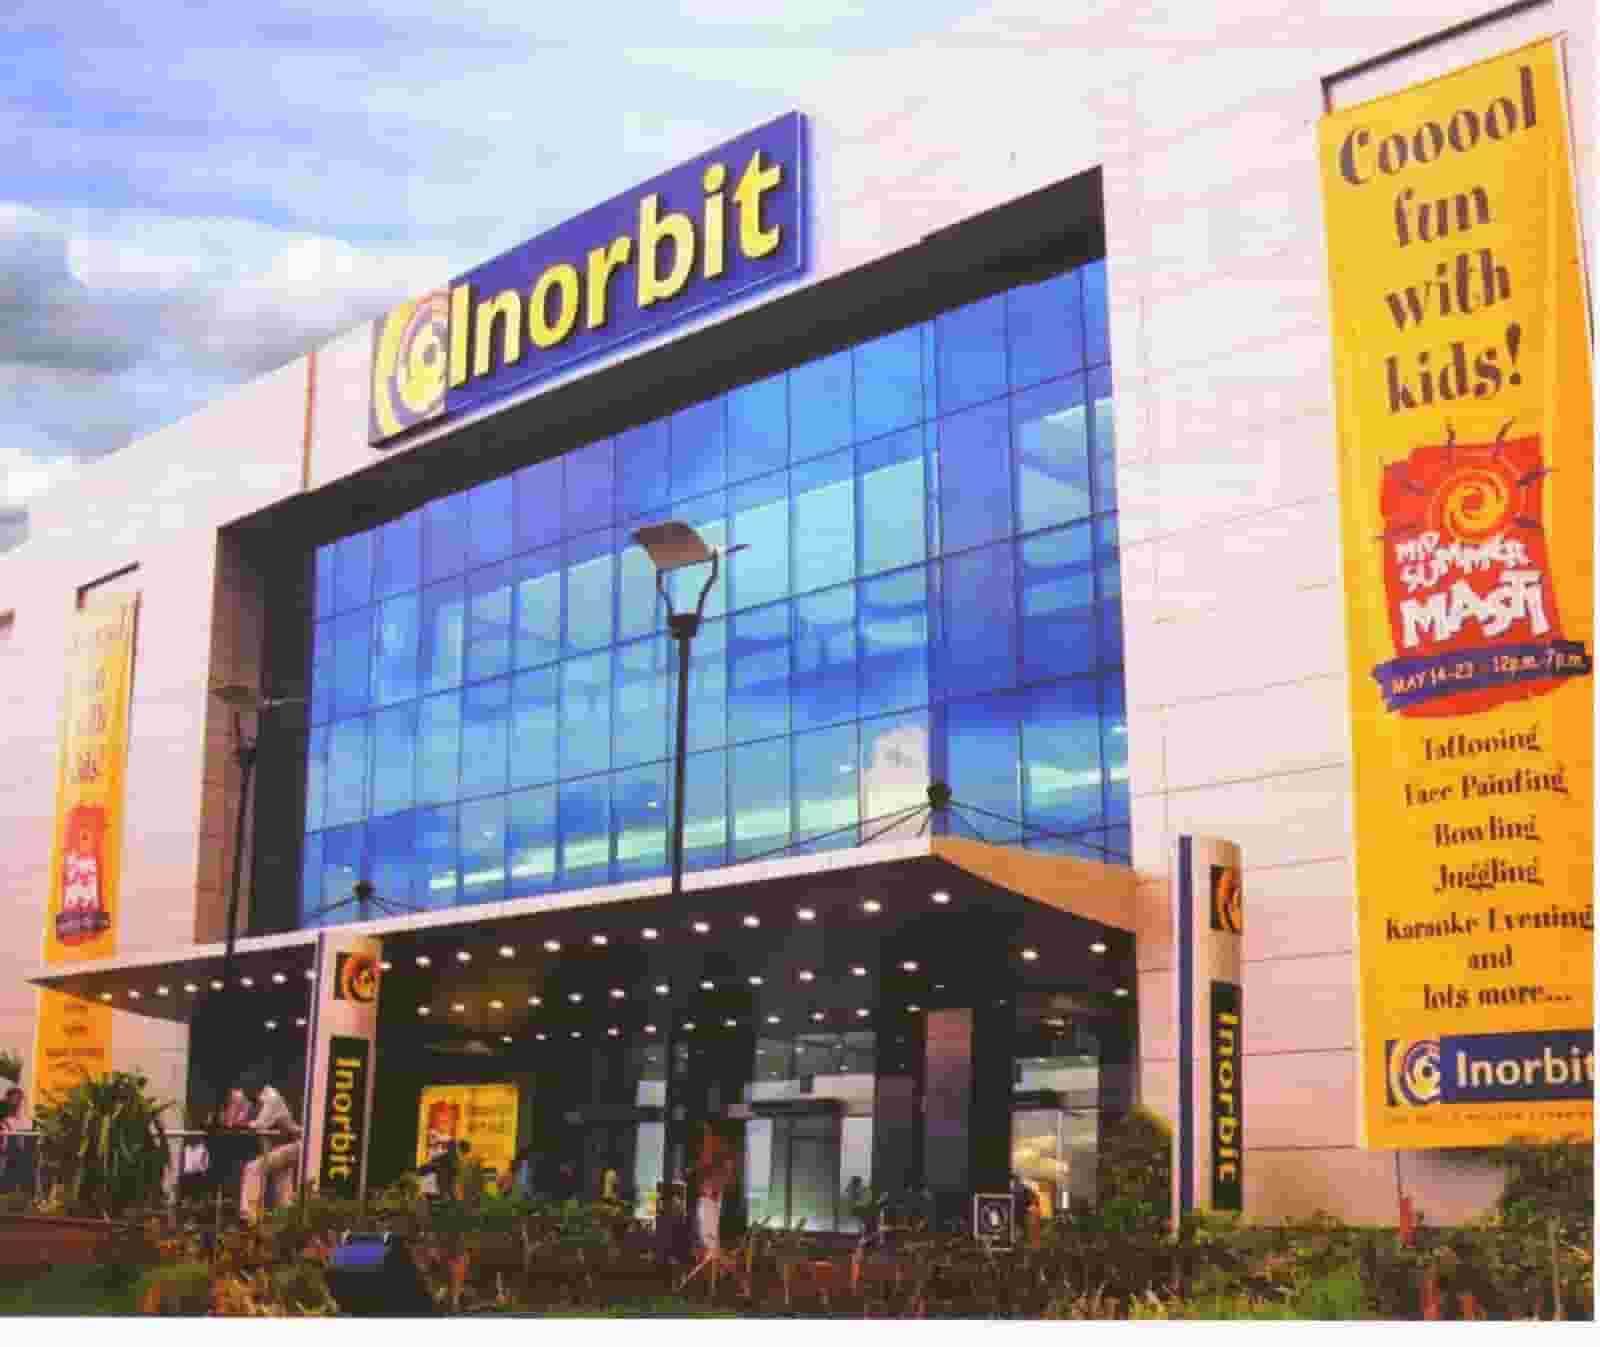 4 BestMalls in Navi Mumbai For Shopping, Food, Fun, and Movie